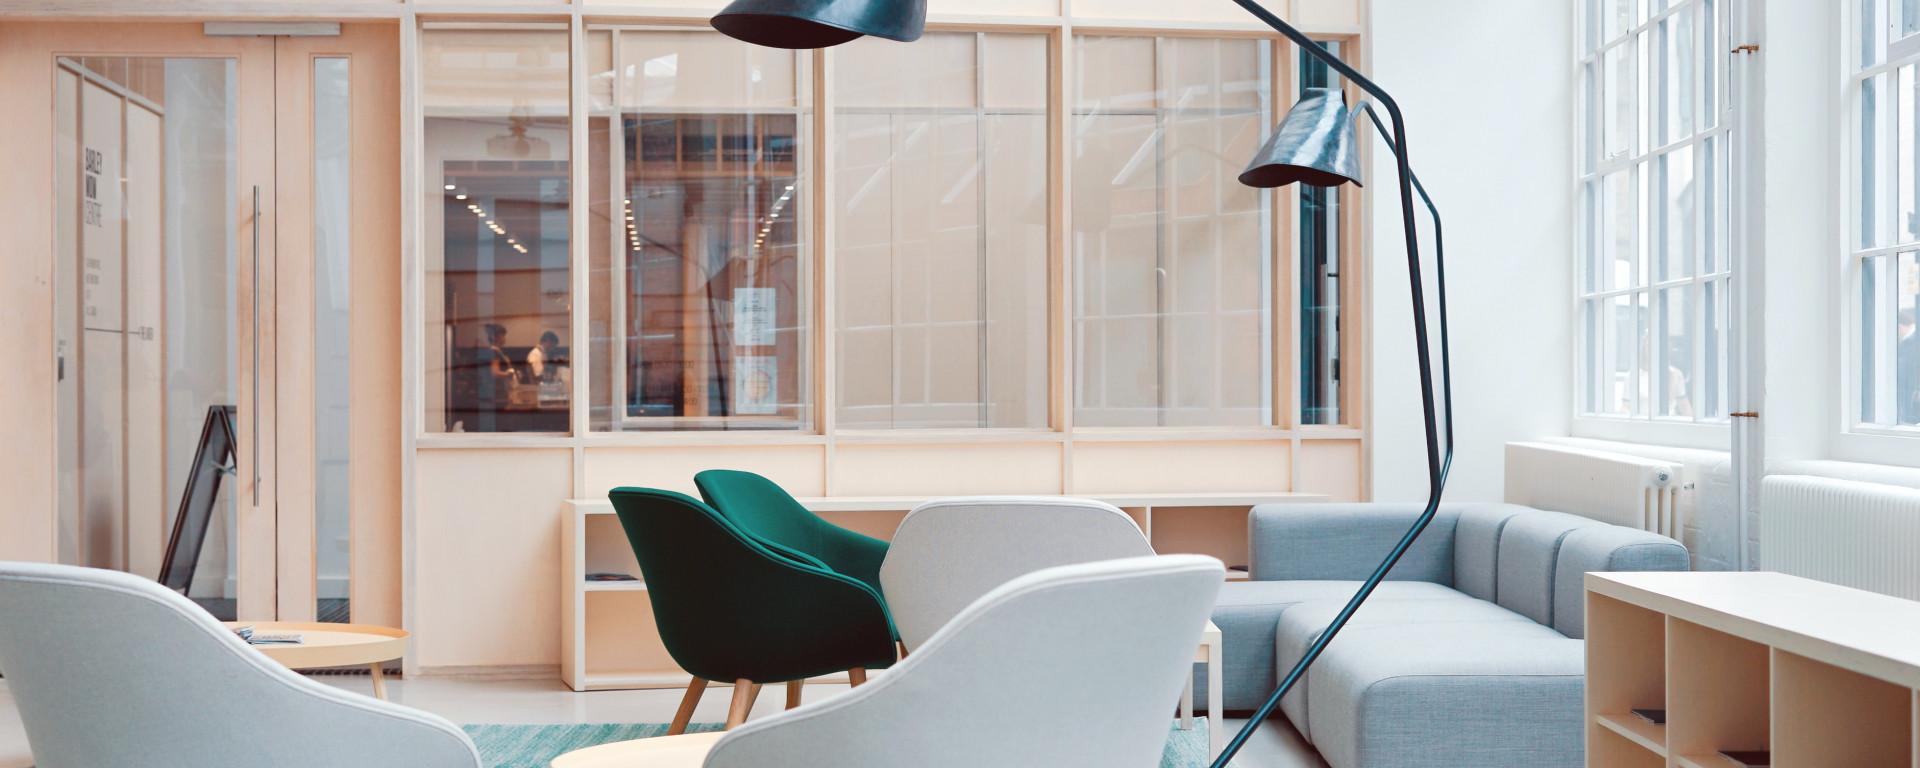 Lighting Interior Design Tips